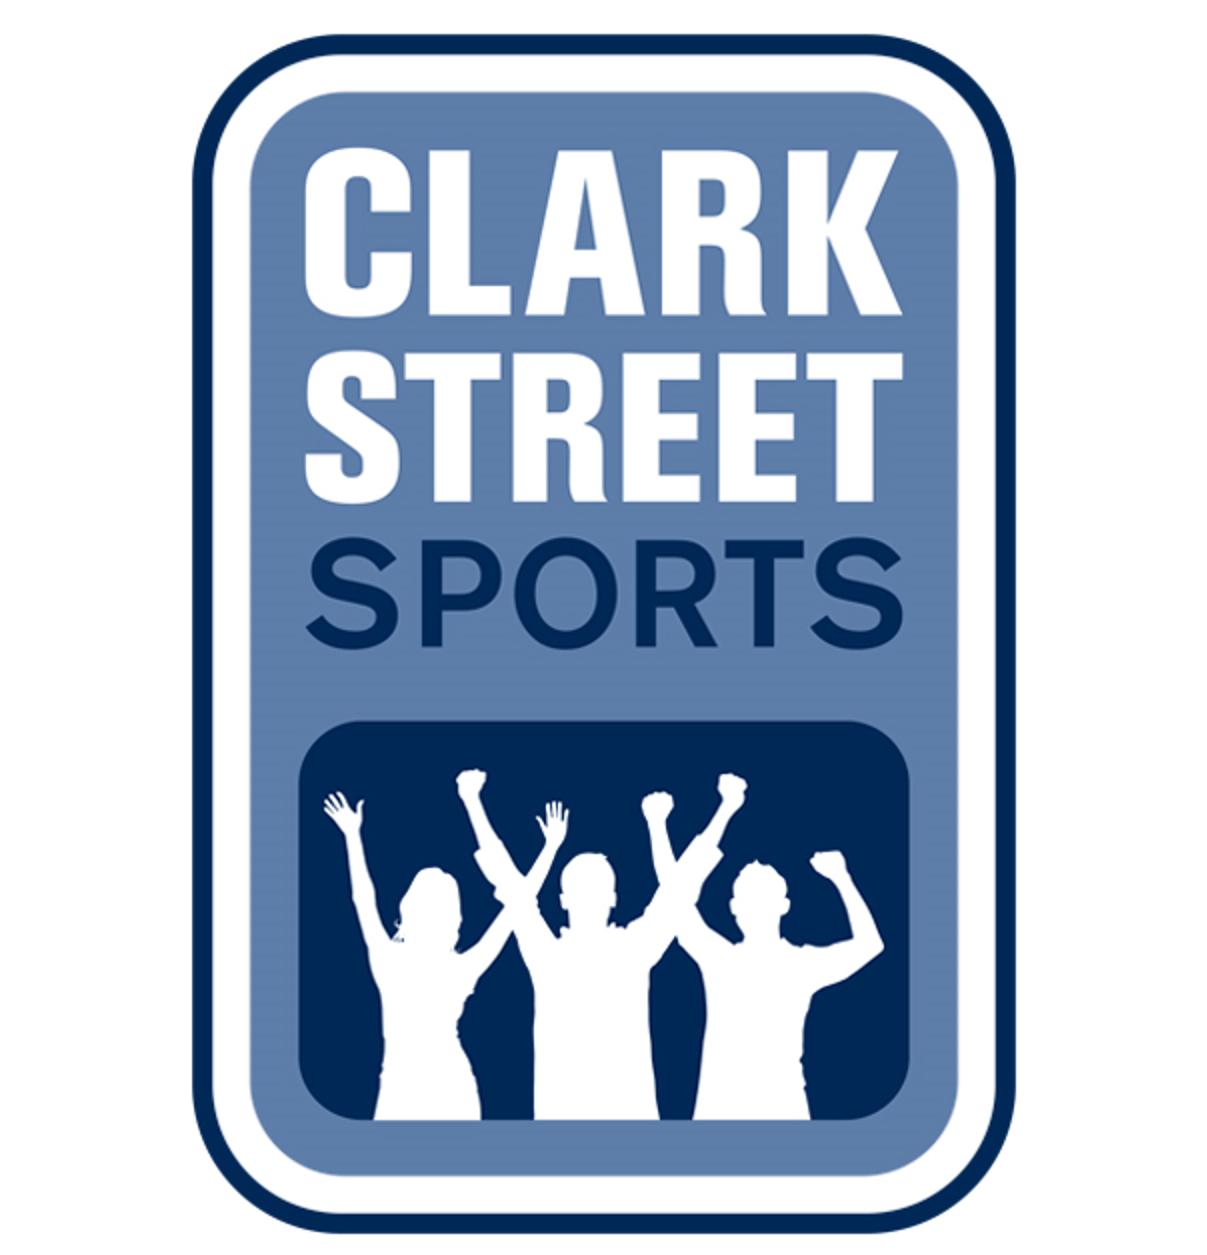 Clark Street Sports.PNG